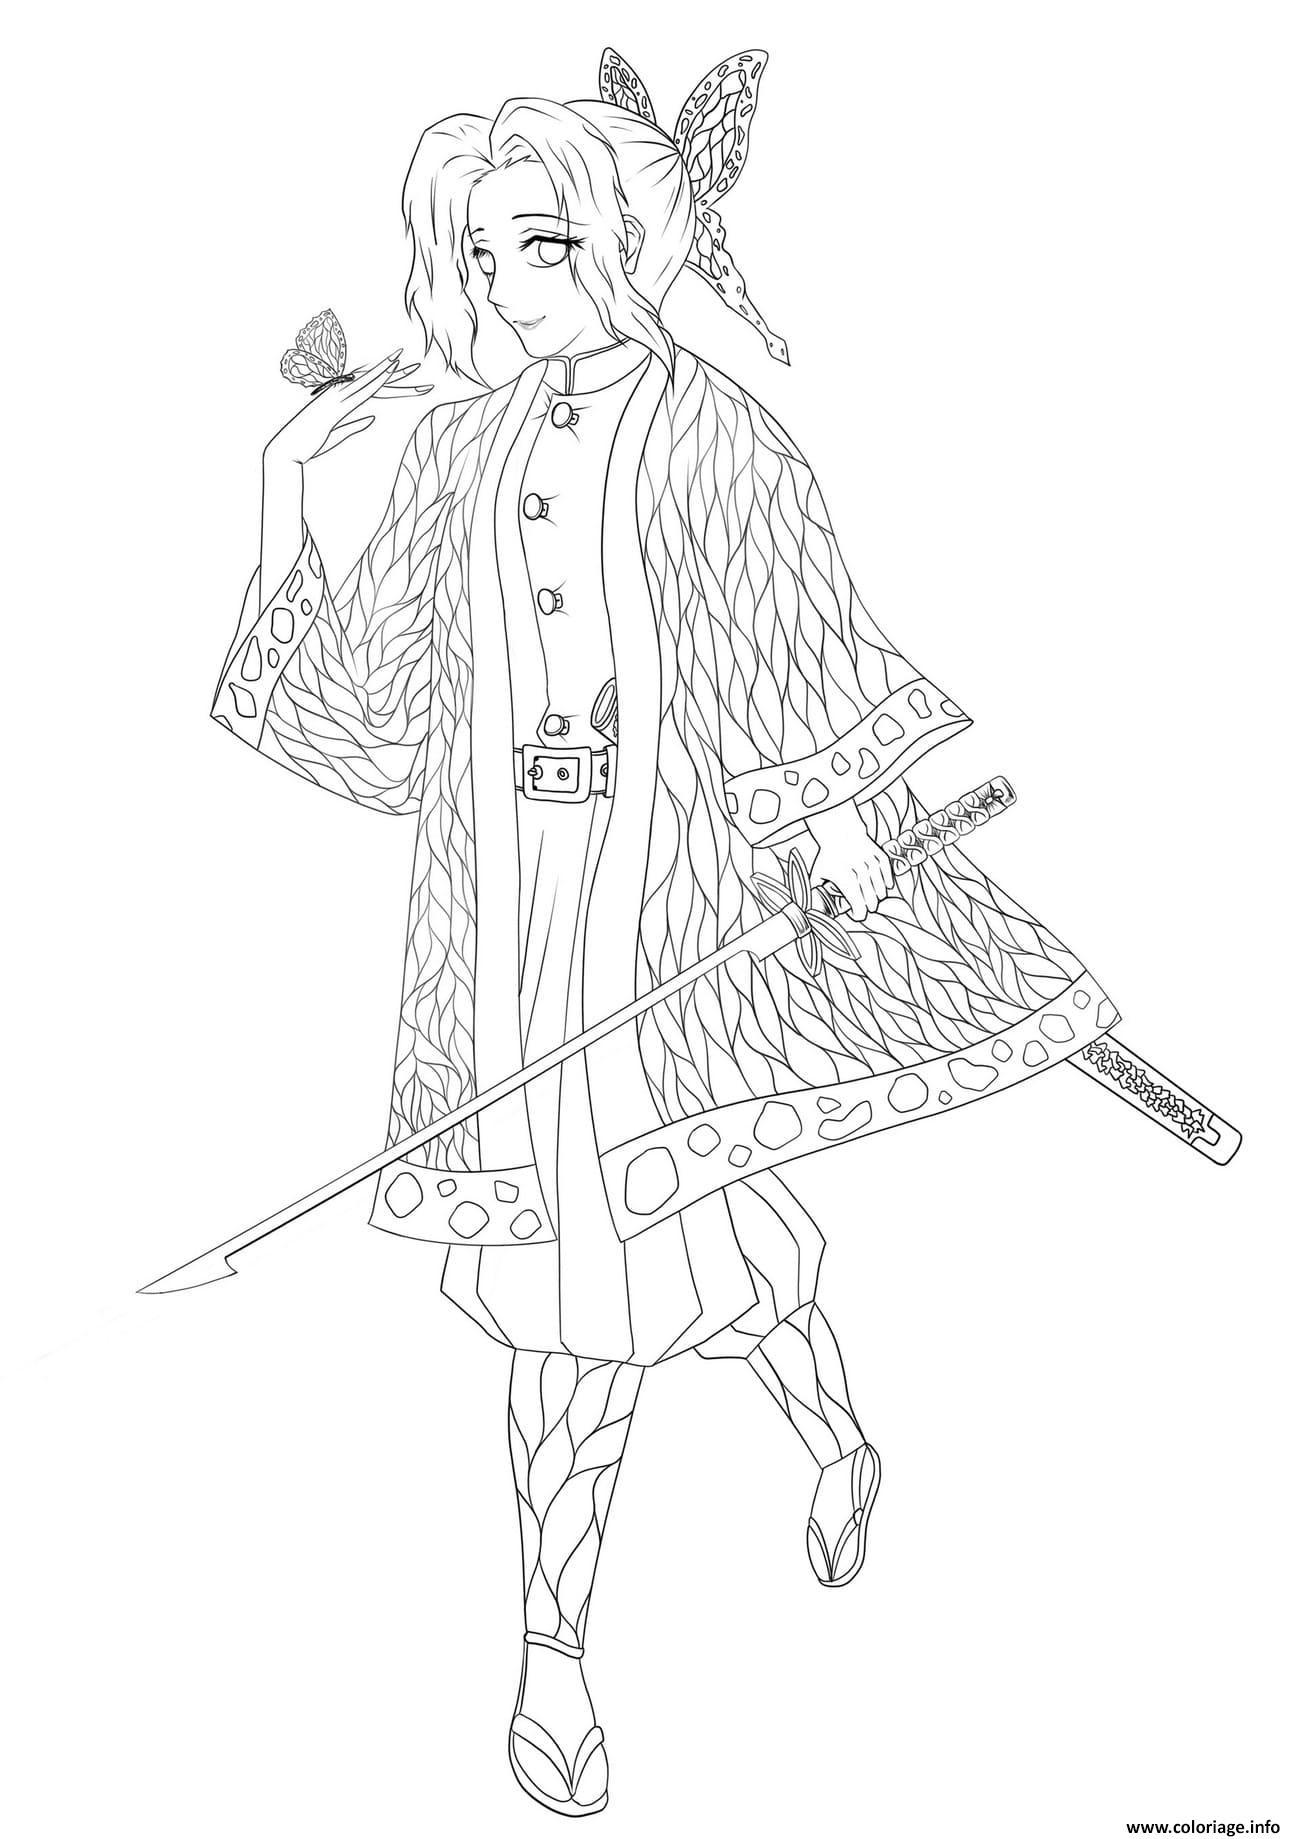 Dessin Shinobu Kocho and the butterfly demon slayer Coloriage Gratuit à Imprimer